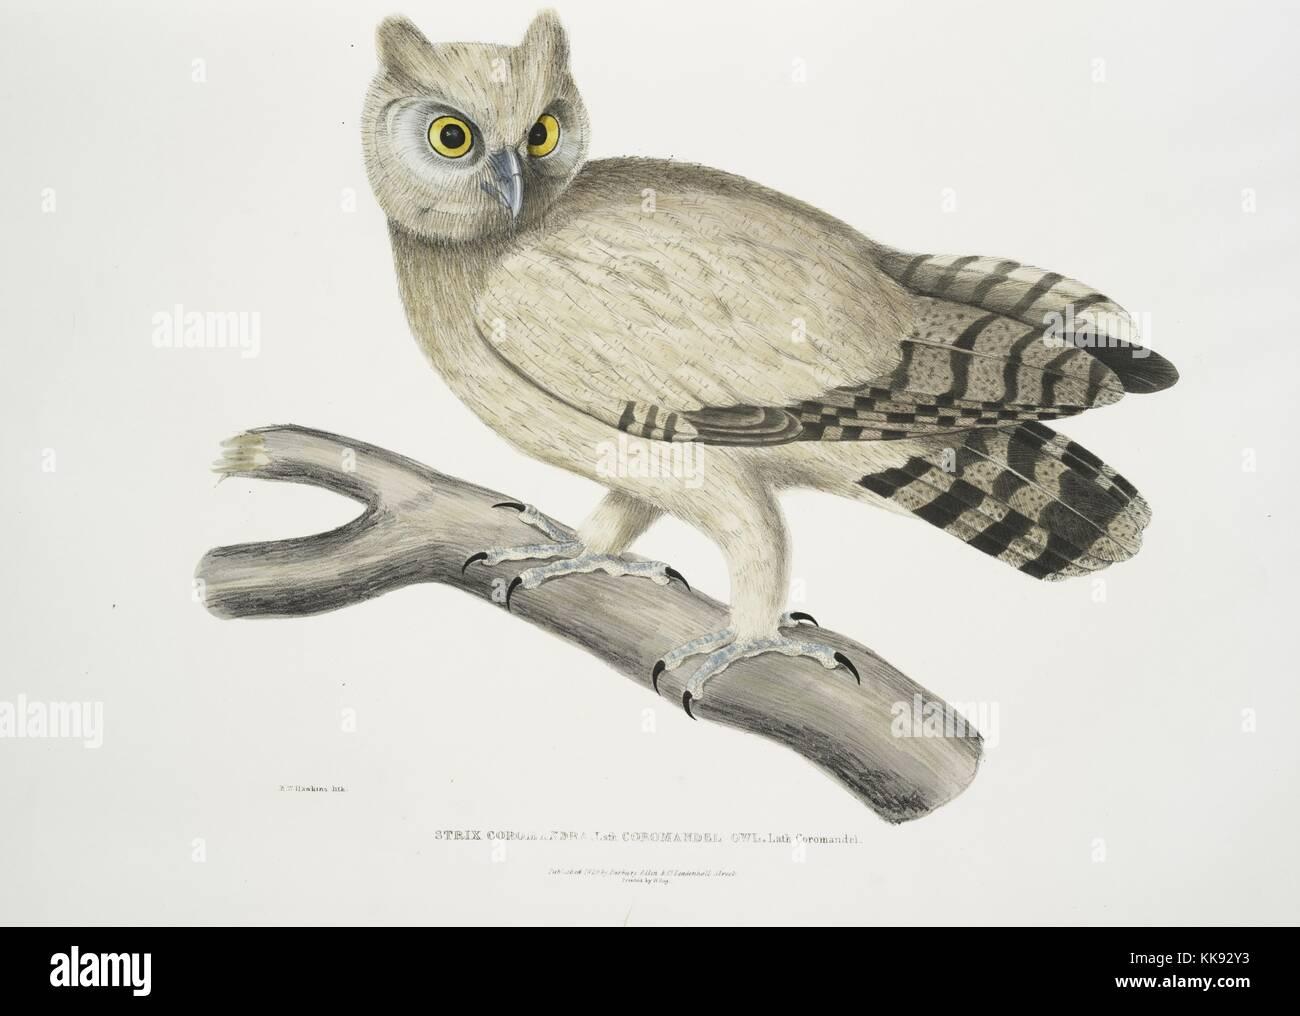 Owl Illustrations Stockfotos & Owl Illustrations Bilder - Alamy